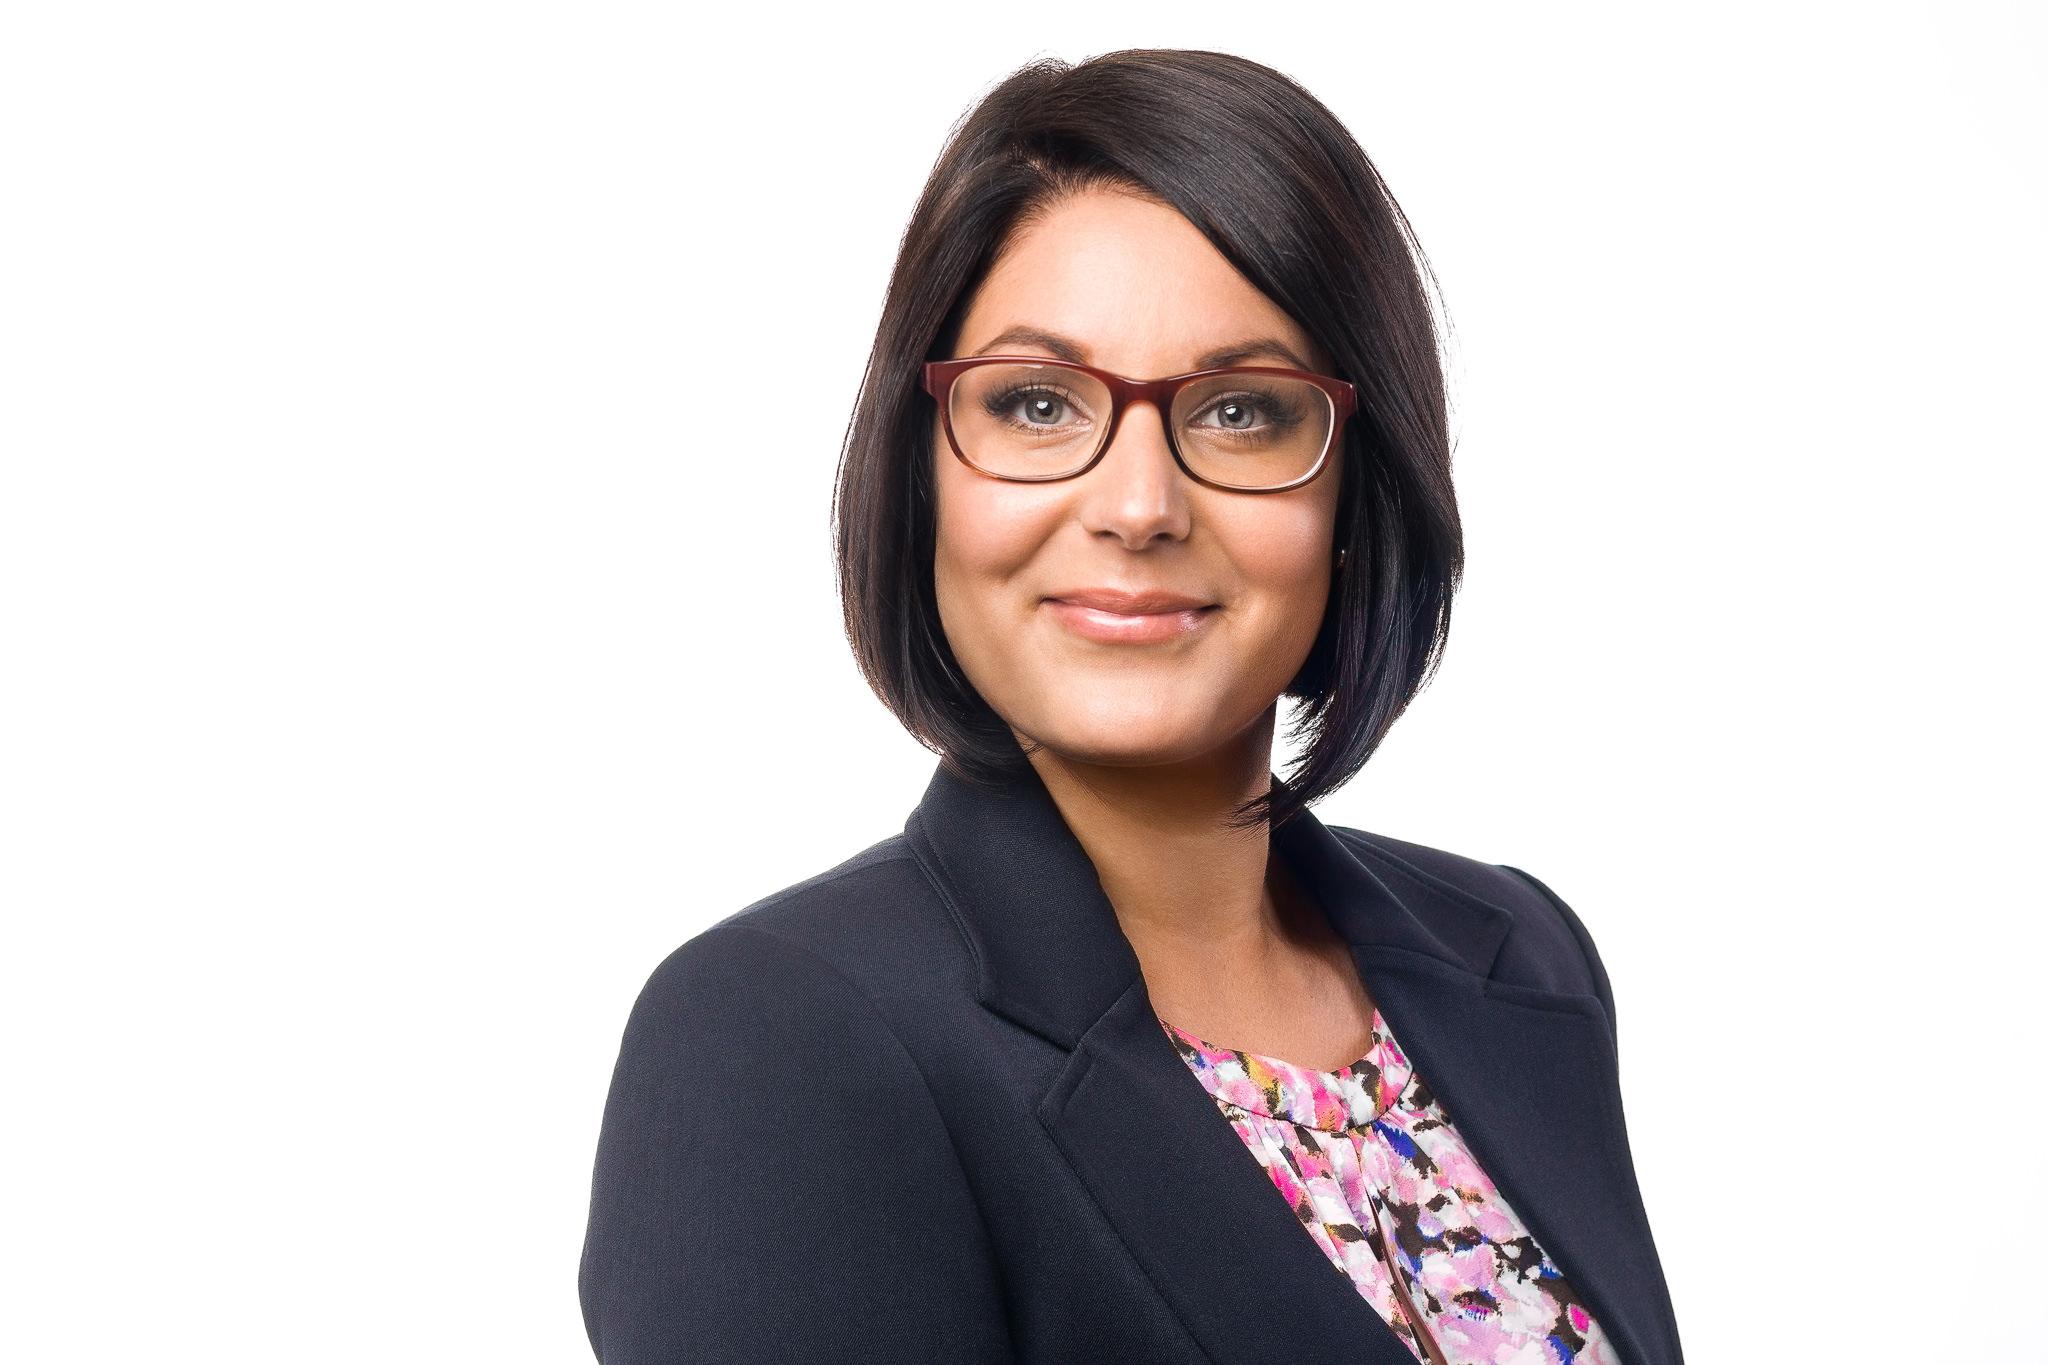 Woman's business headshot in Hamilton, Ontario.